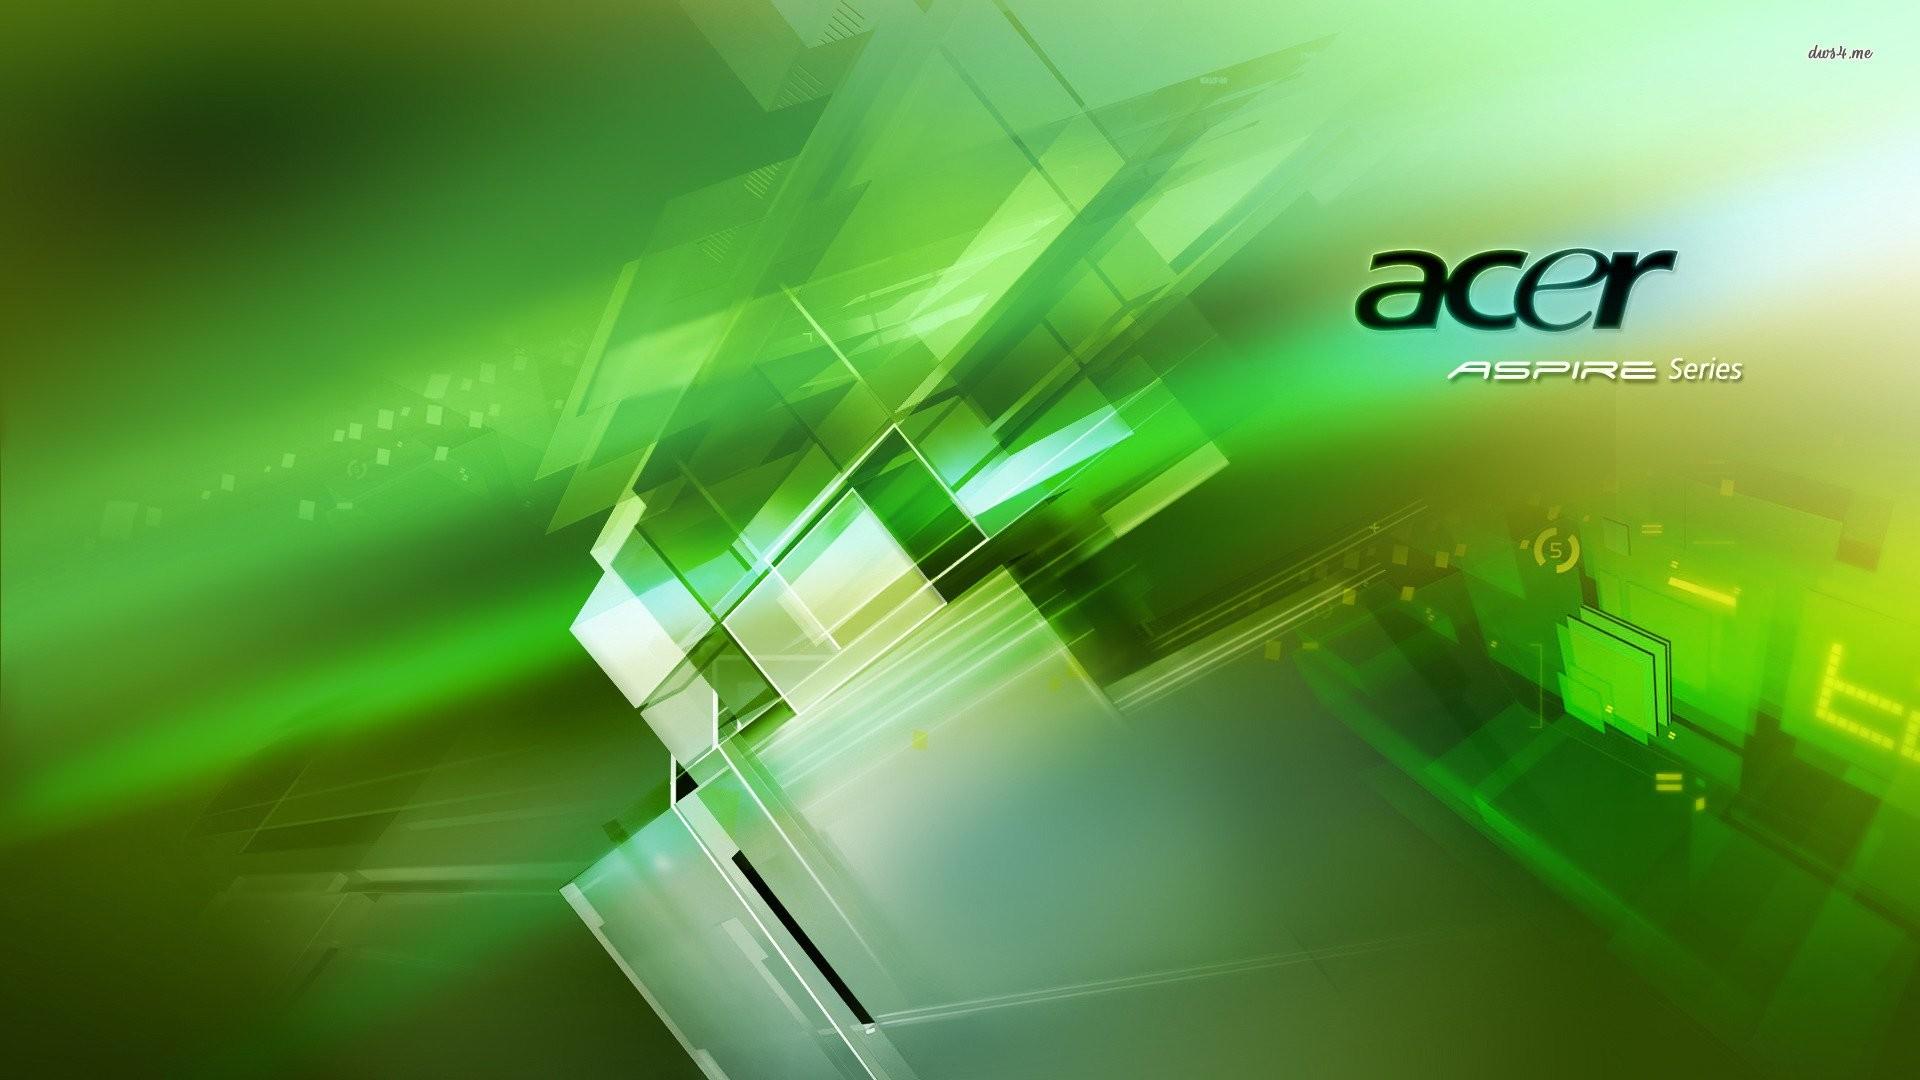 Wallpaper for Acer Laptop – WallpaperSafari